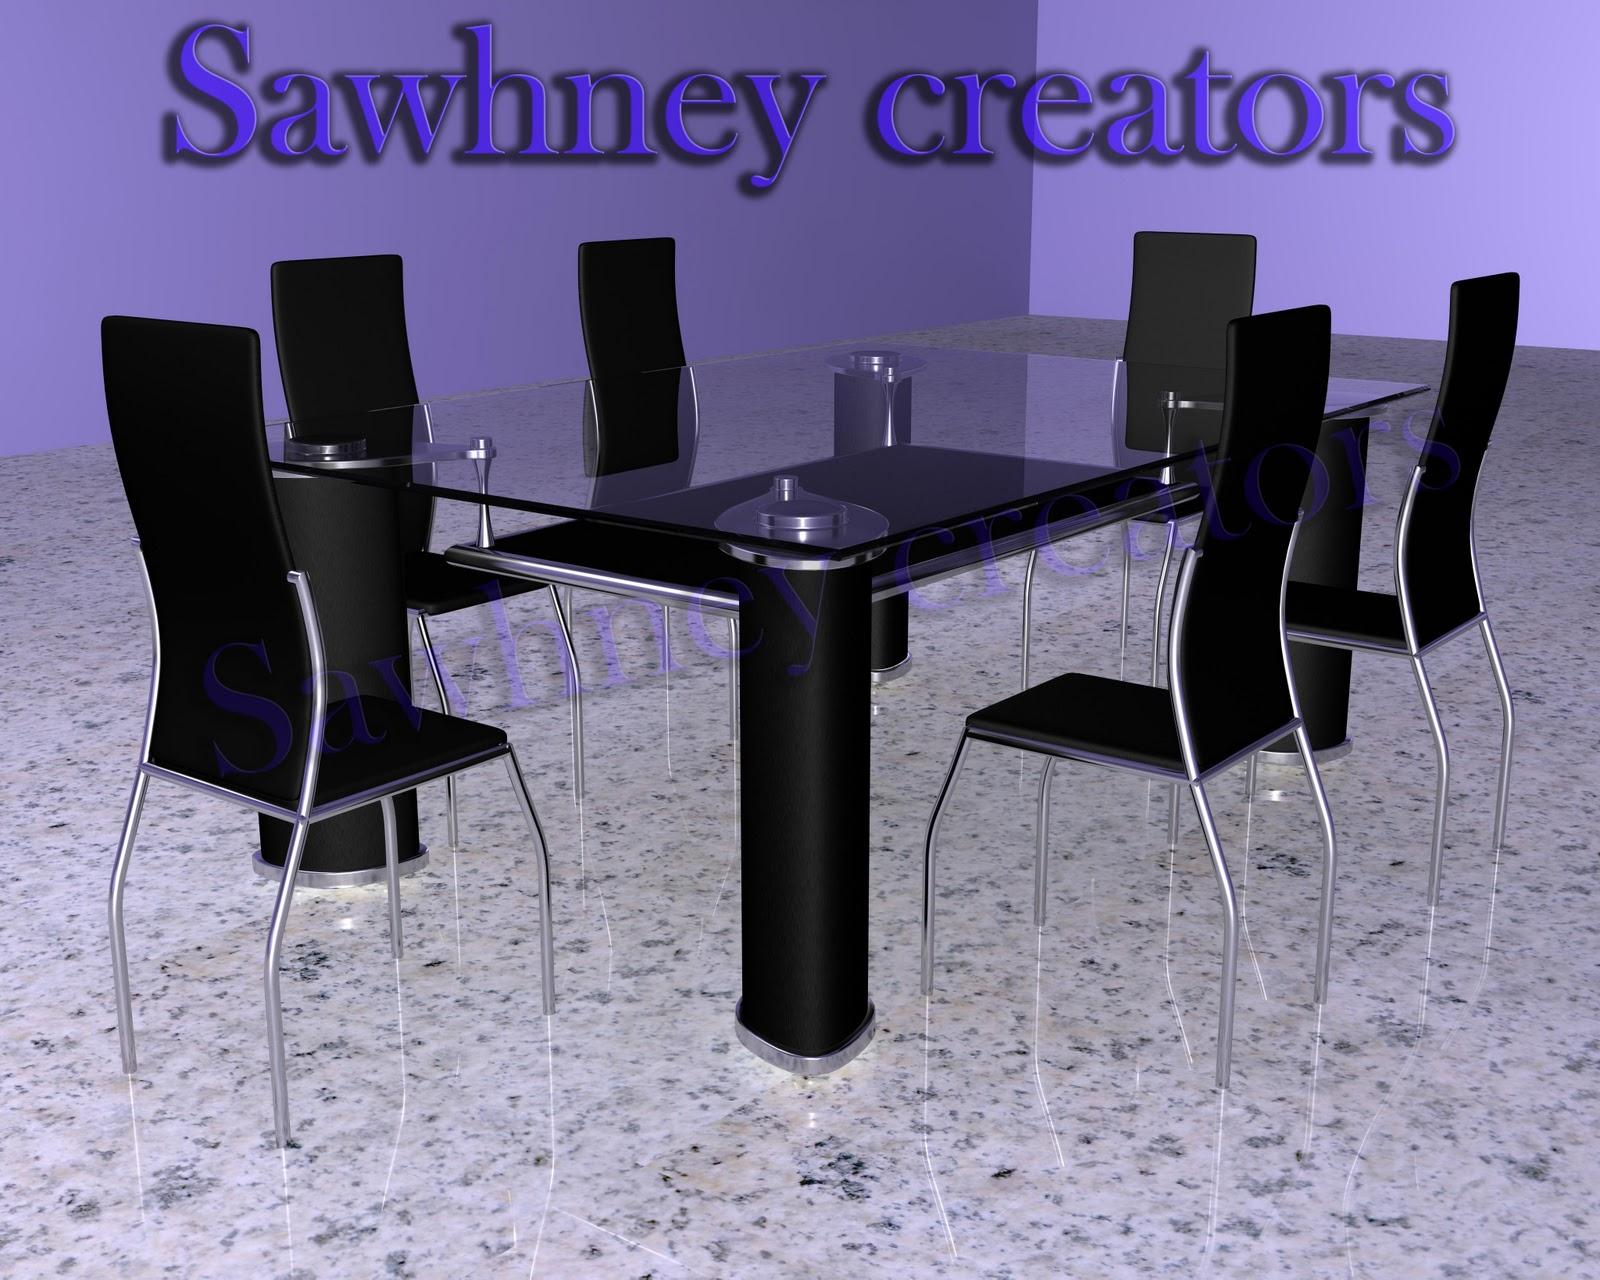 3d models : diningtable3Dmodel from sawhneycreators.blogspot.com size 1600 x 1280 jpeg 337kB